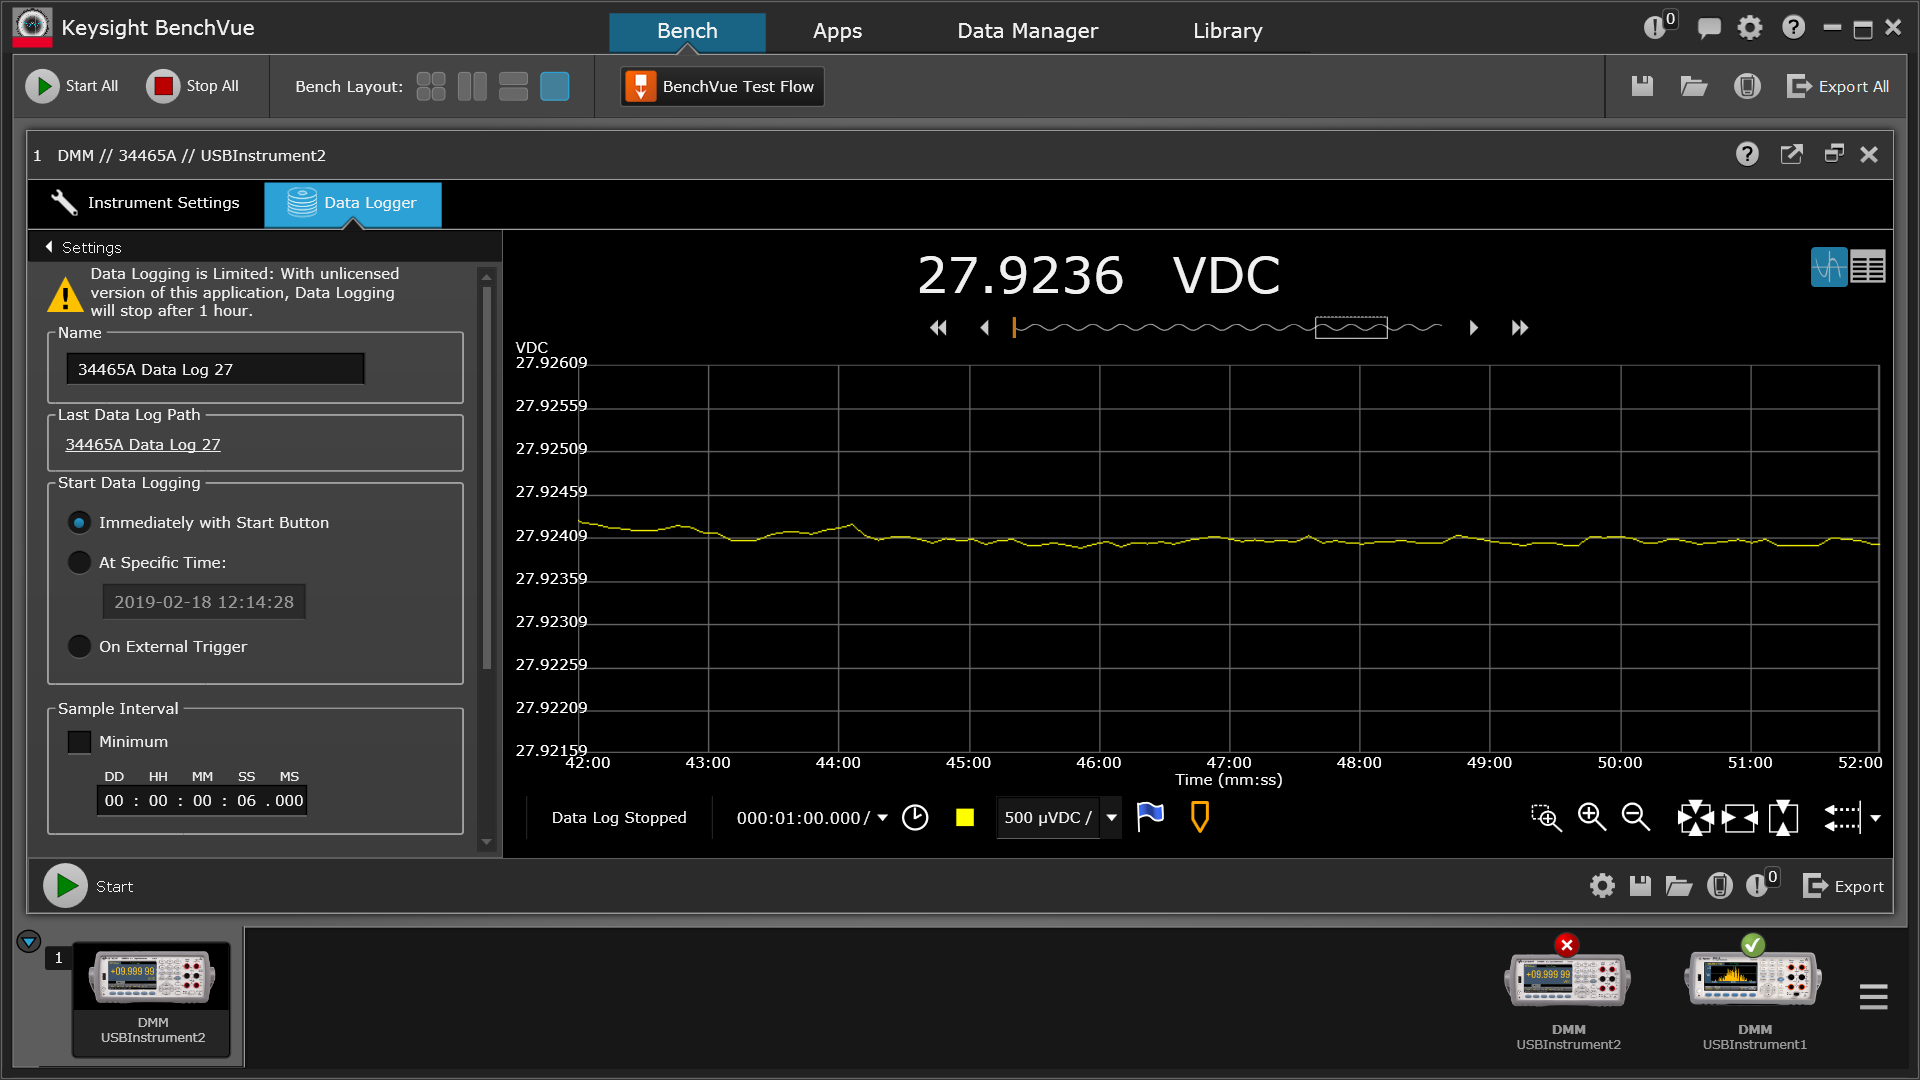 45 20190217 ZeroZone 28V 56R load t=42 to 52min drift - 34465A.png